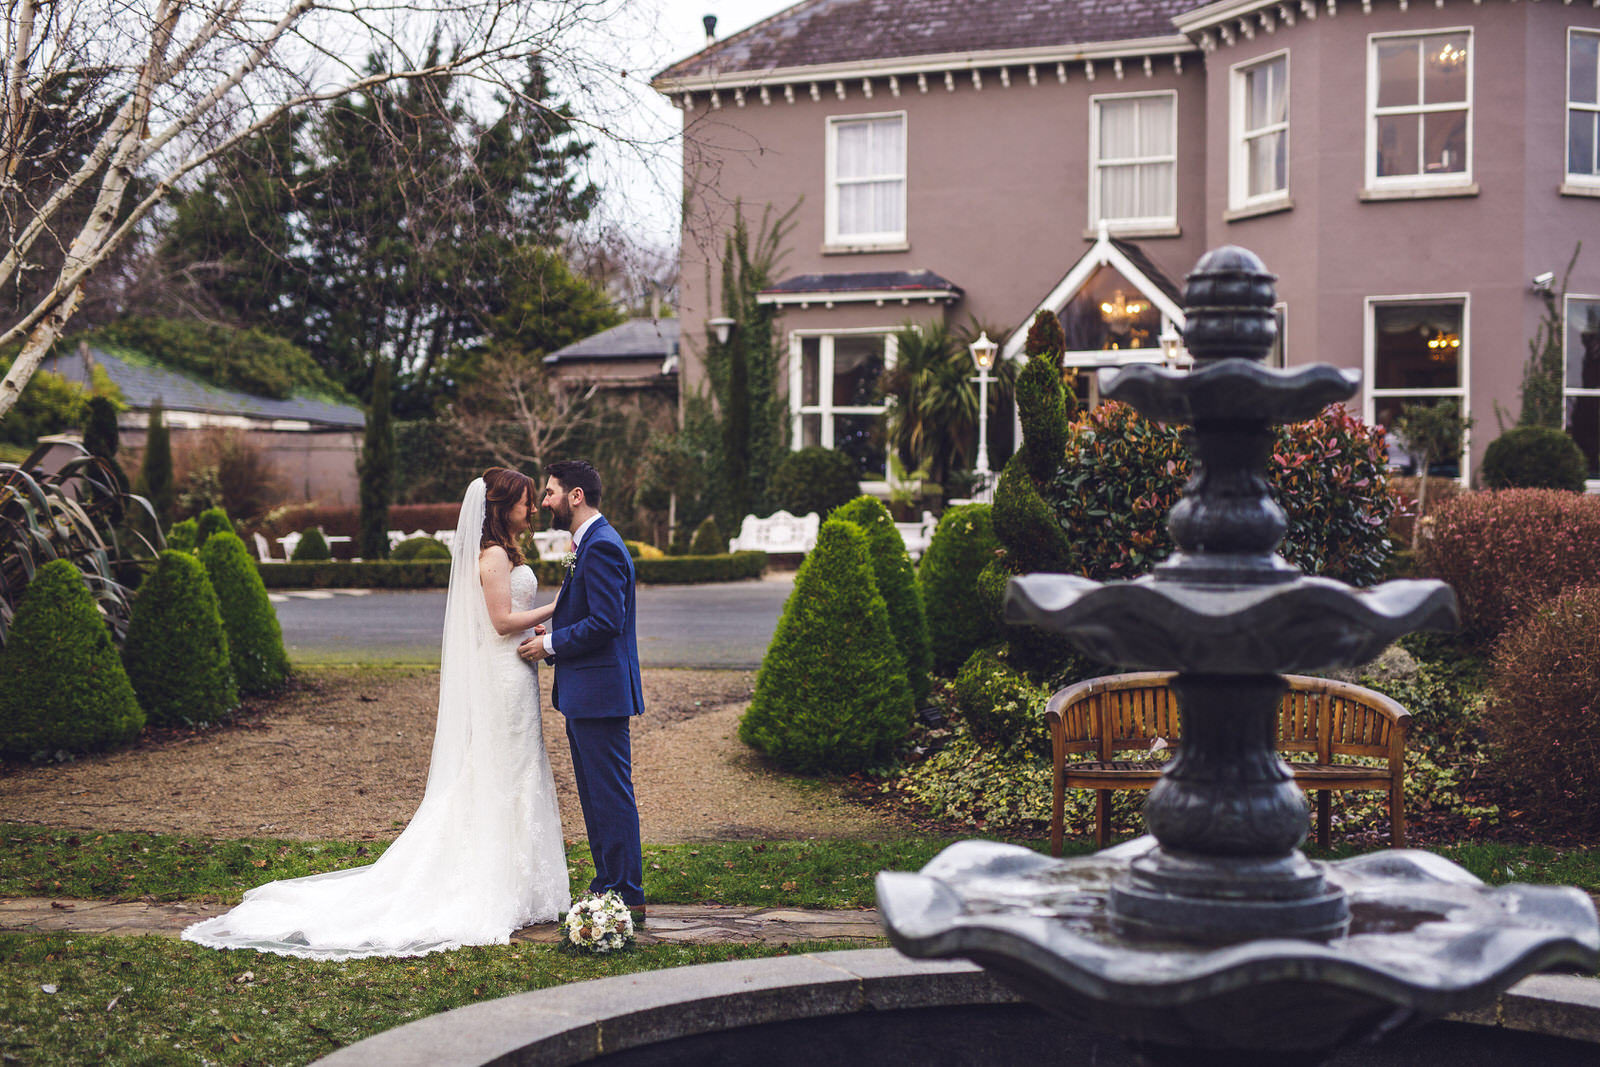 Roger-kenny-wedding-photographer-greystones-wicklow-dublin_066.jpg